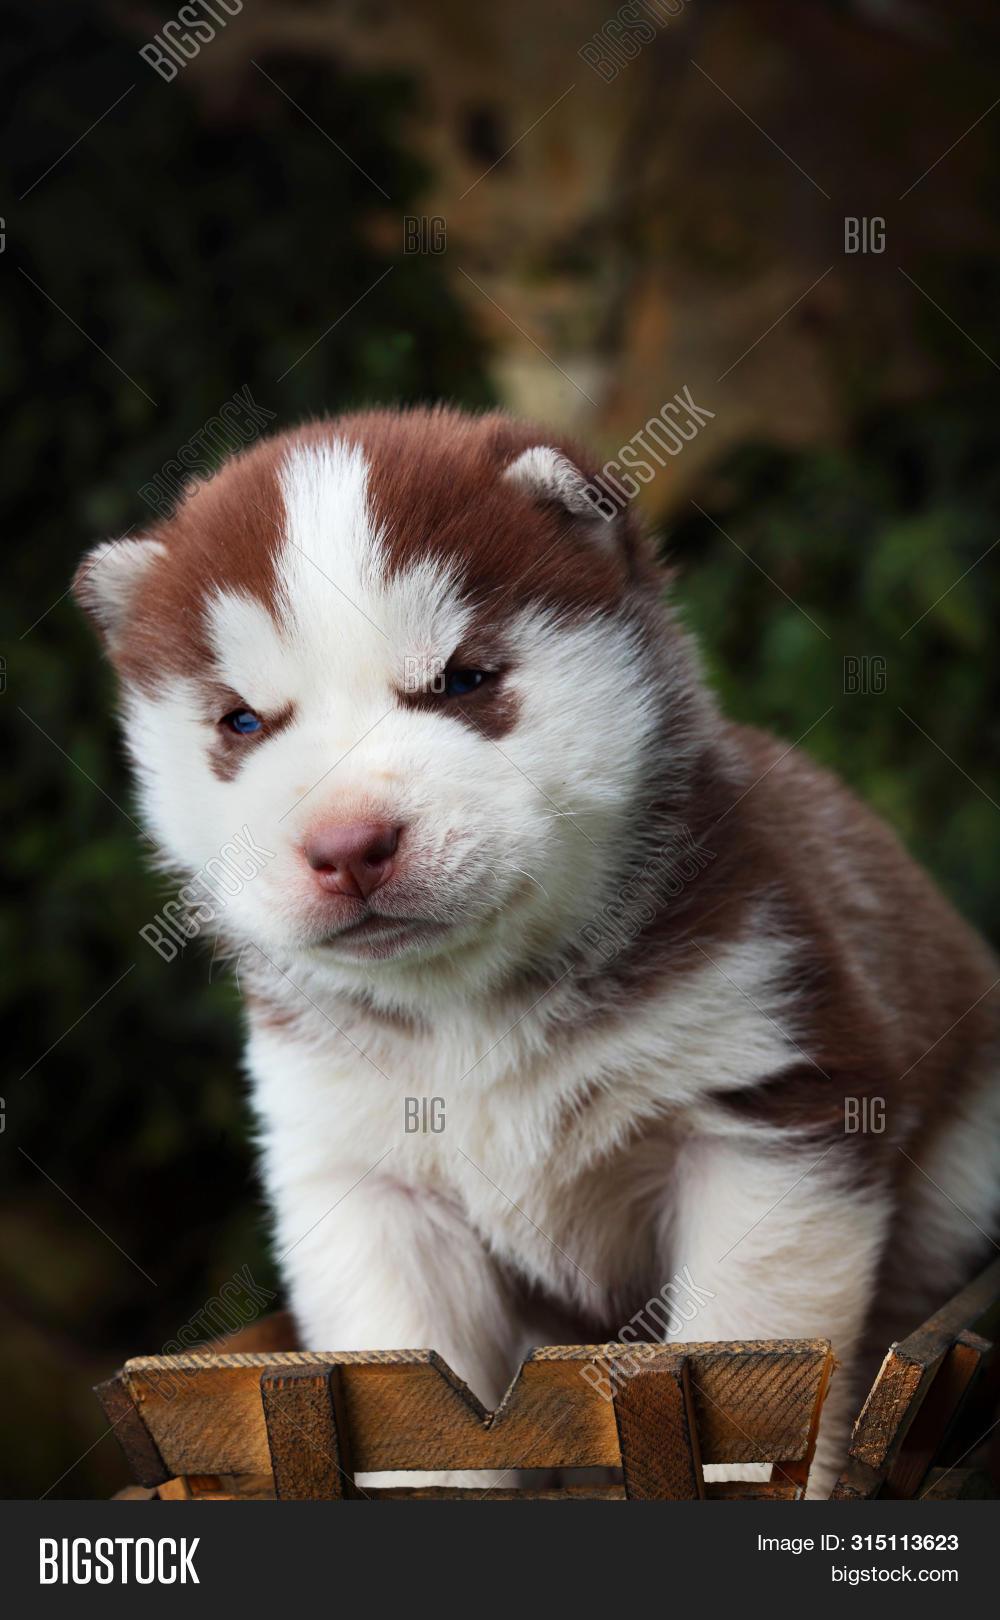 Siberian Husky Little Image Photo Free Trial Bigstock